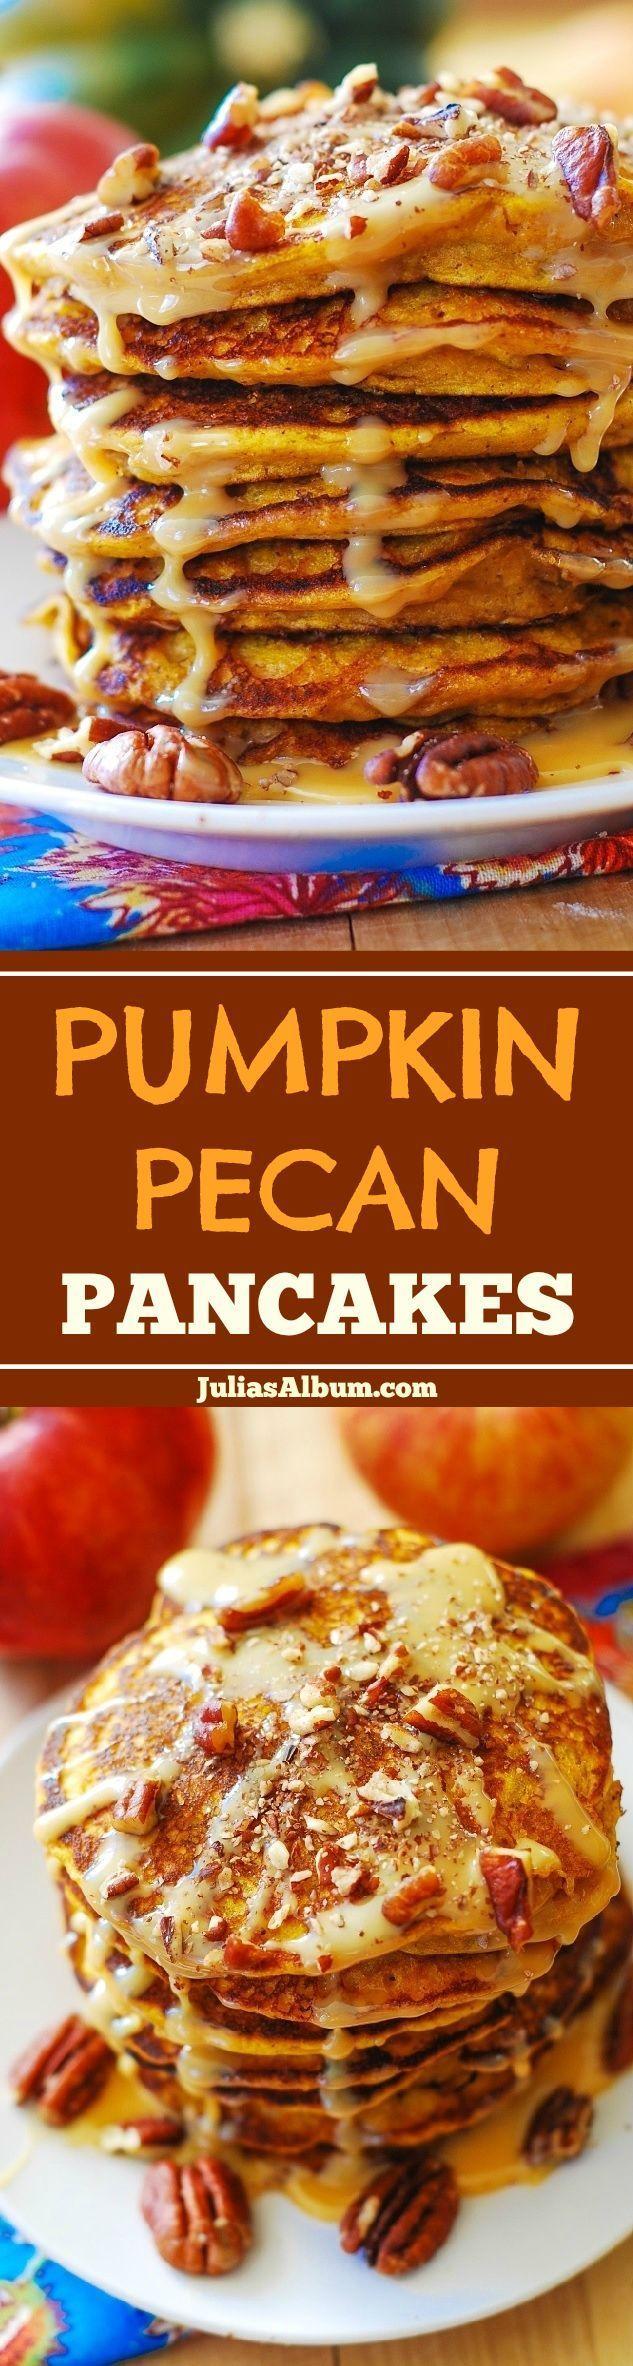 Pumpkin-Pecan Pancakes with Pecan Sauce #Thanksgiving #Fall #Holidays #breakfast via @juliasalbum/